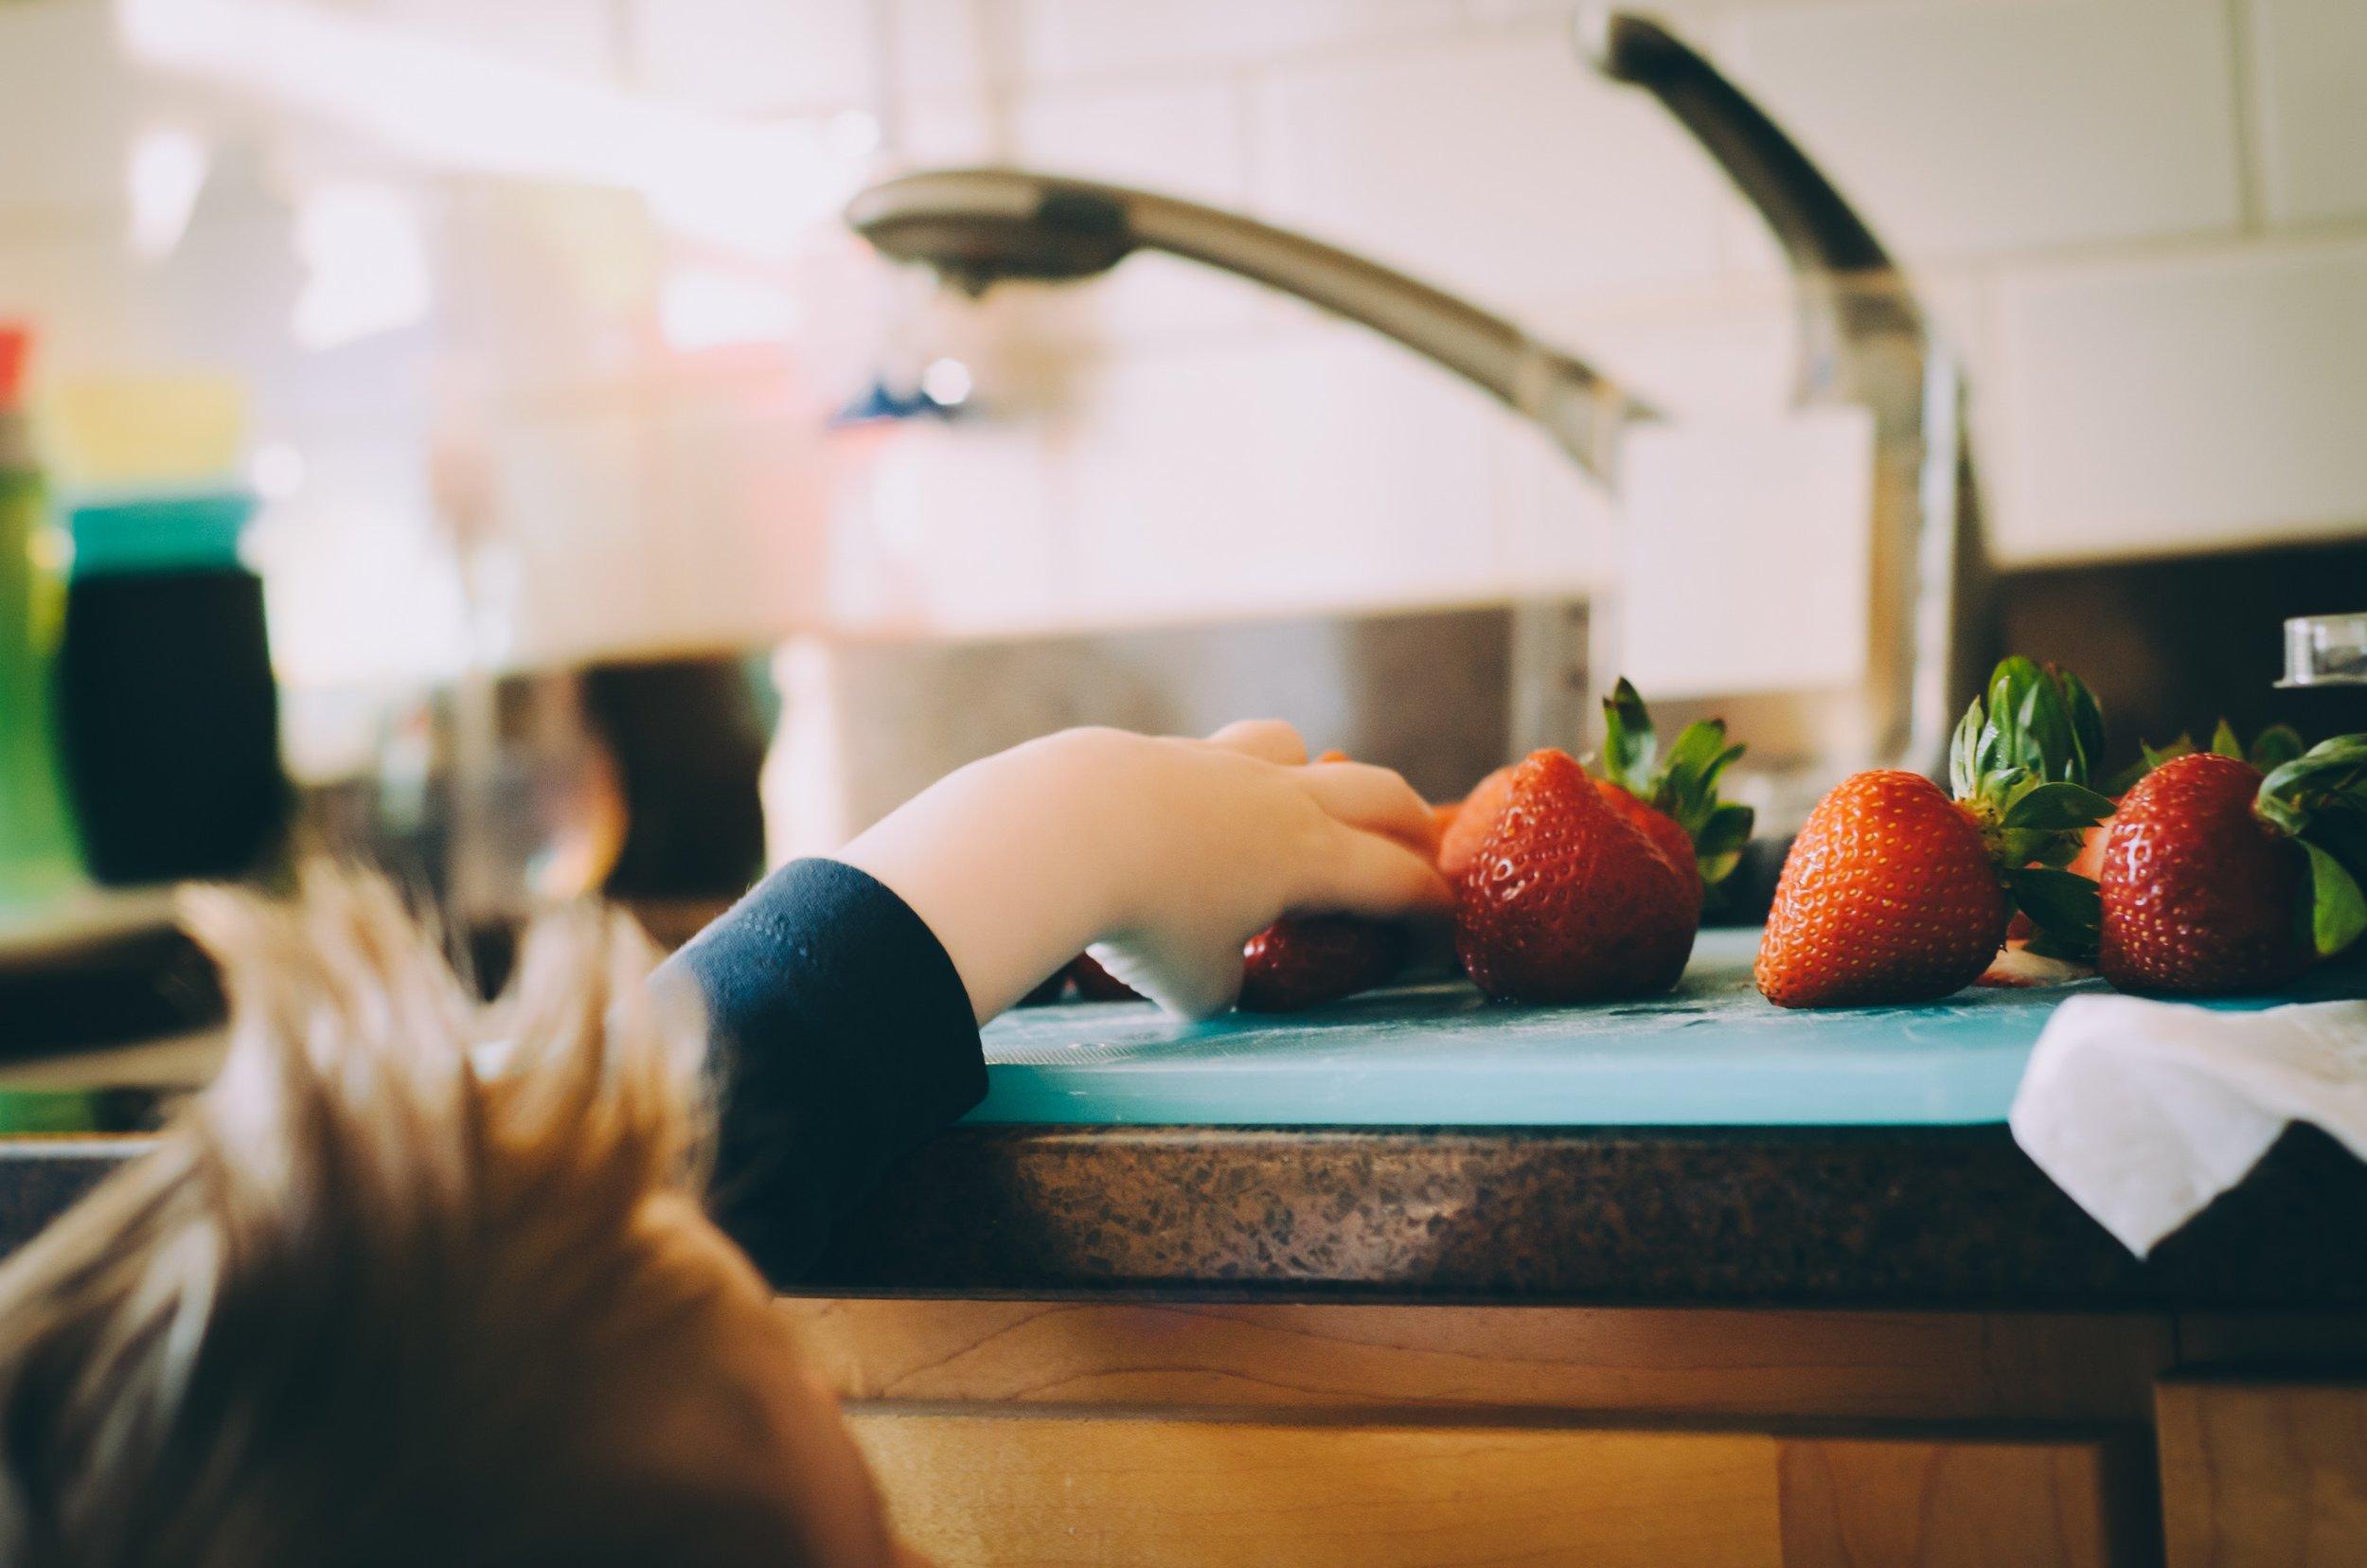 Child-eating-strawberries-hungry.jpg